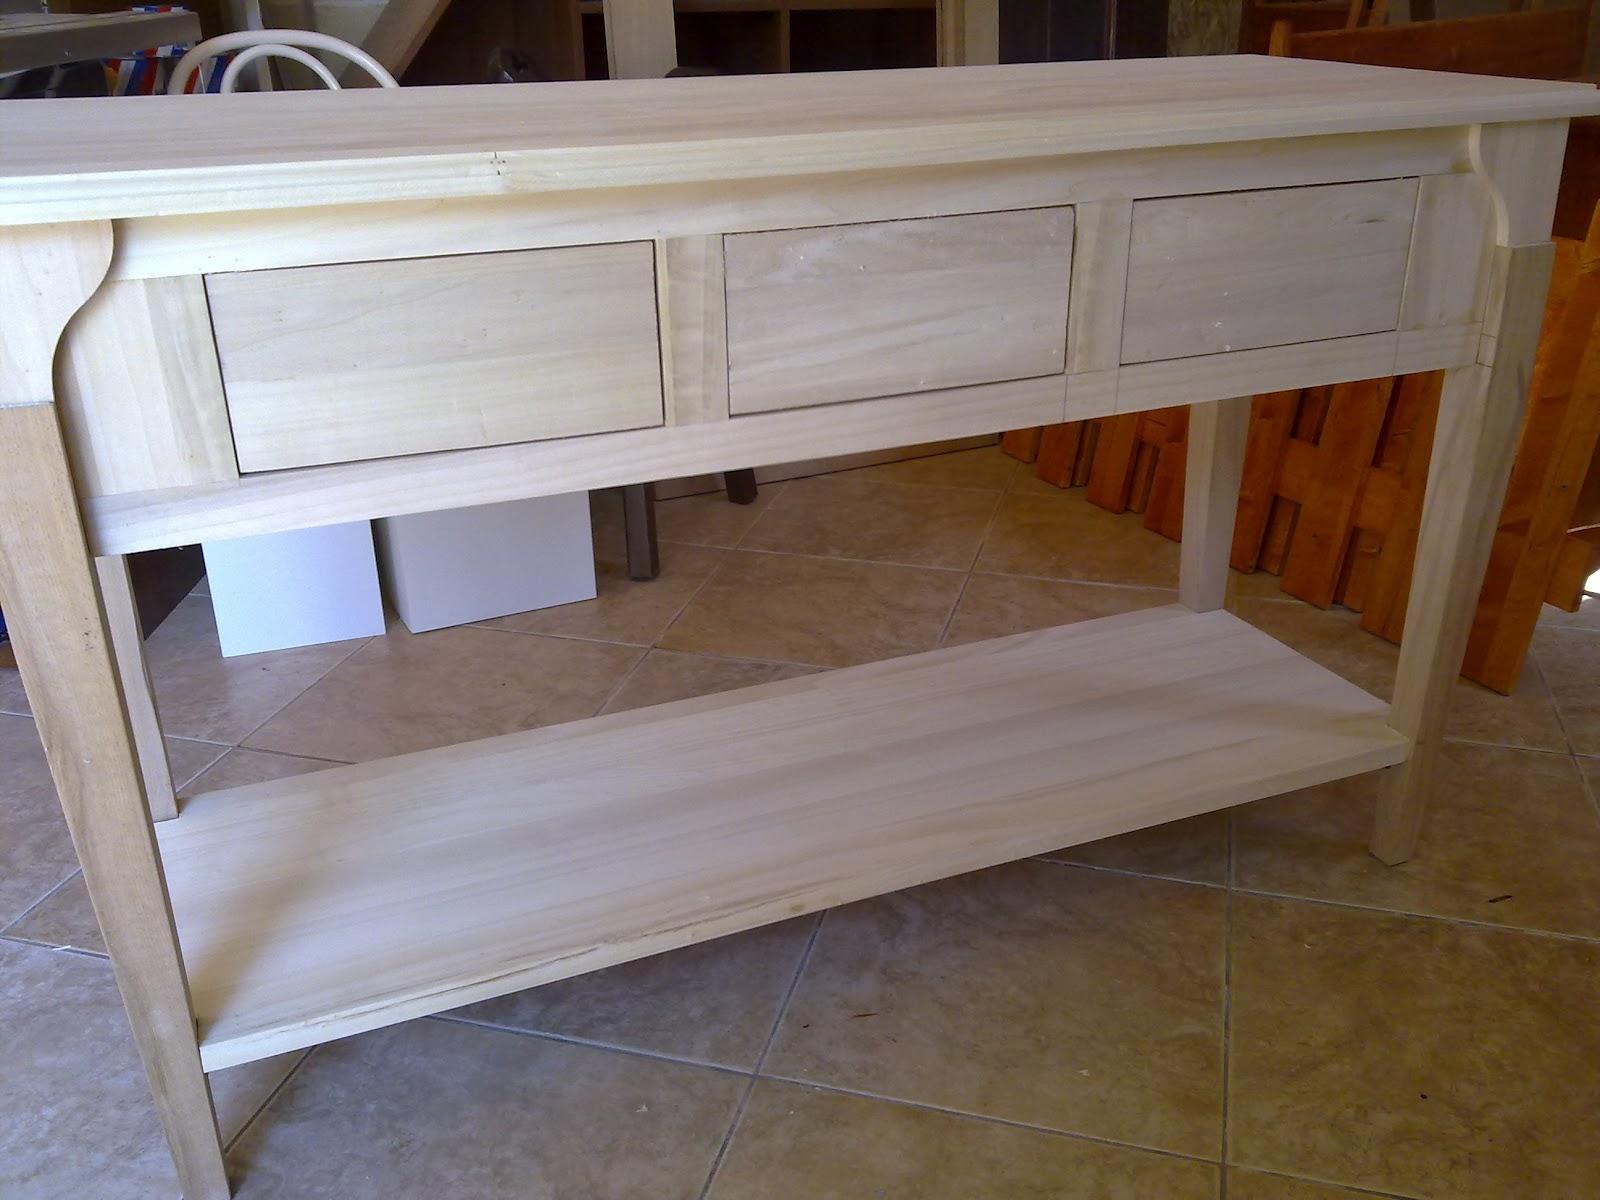 Fai da te hobby legno mobile da salotto - Mobile sottolavabo bagno fai da te ...